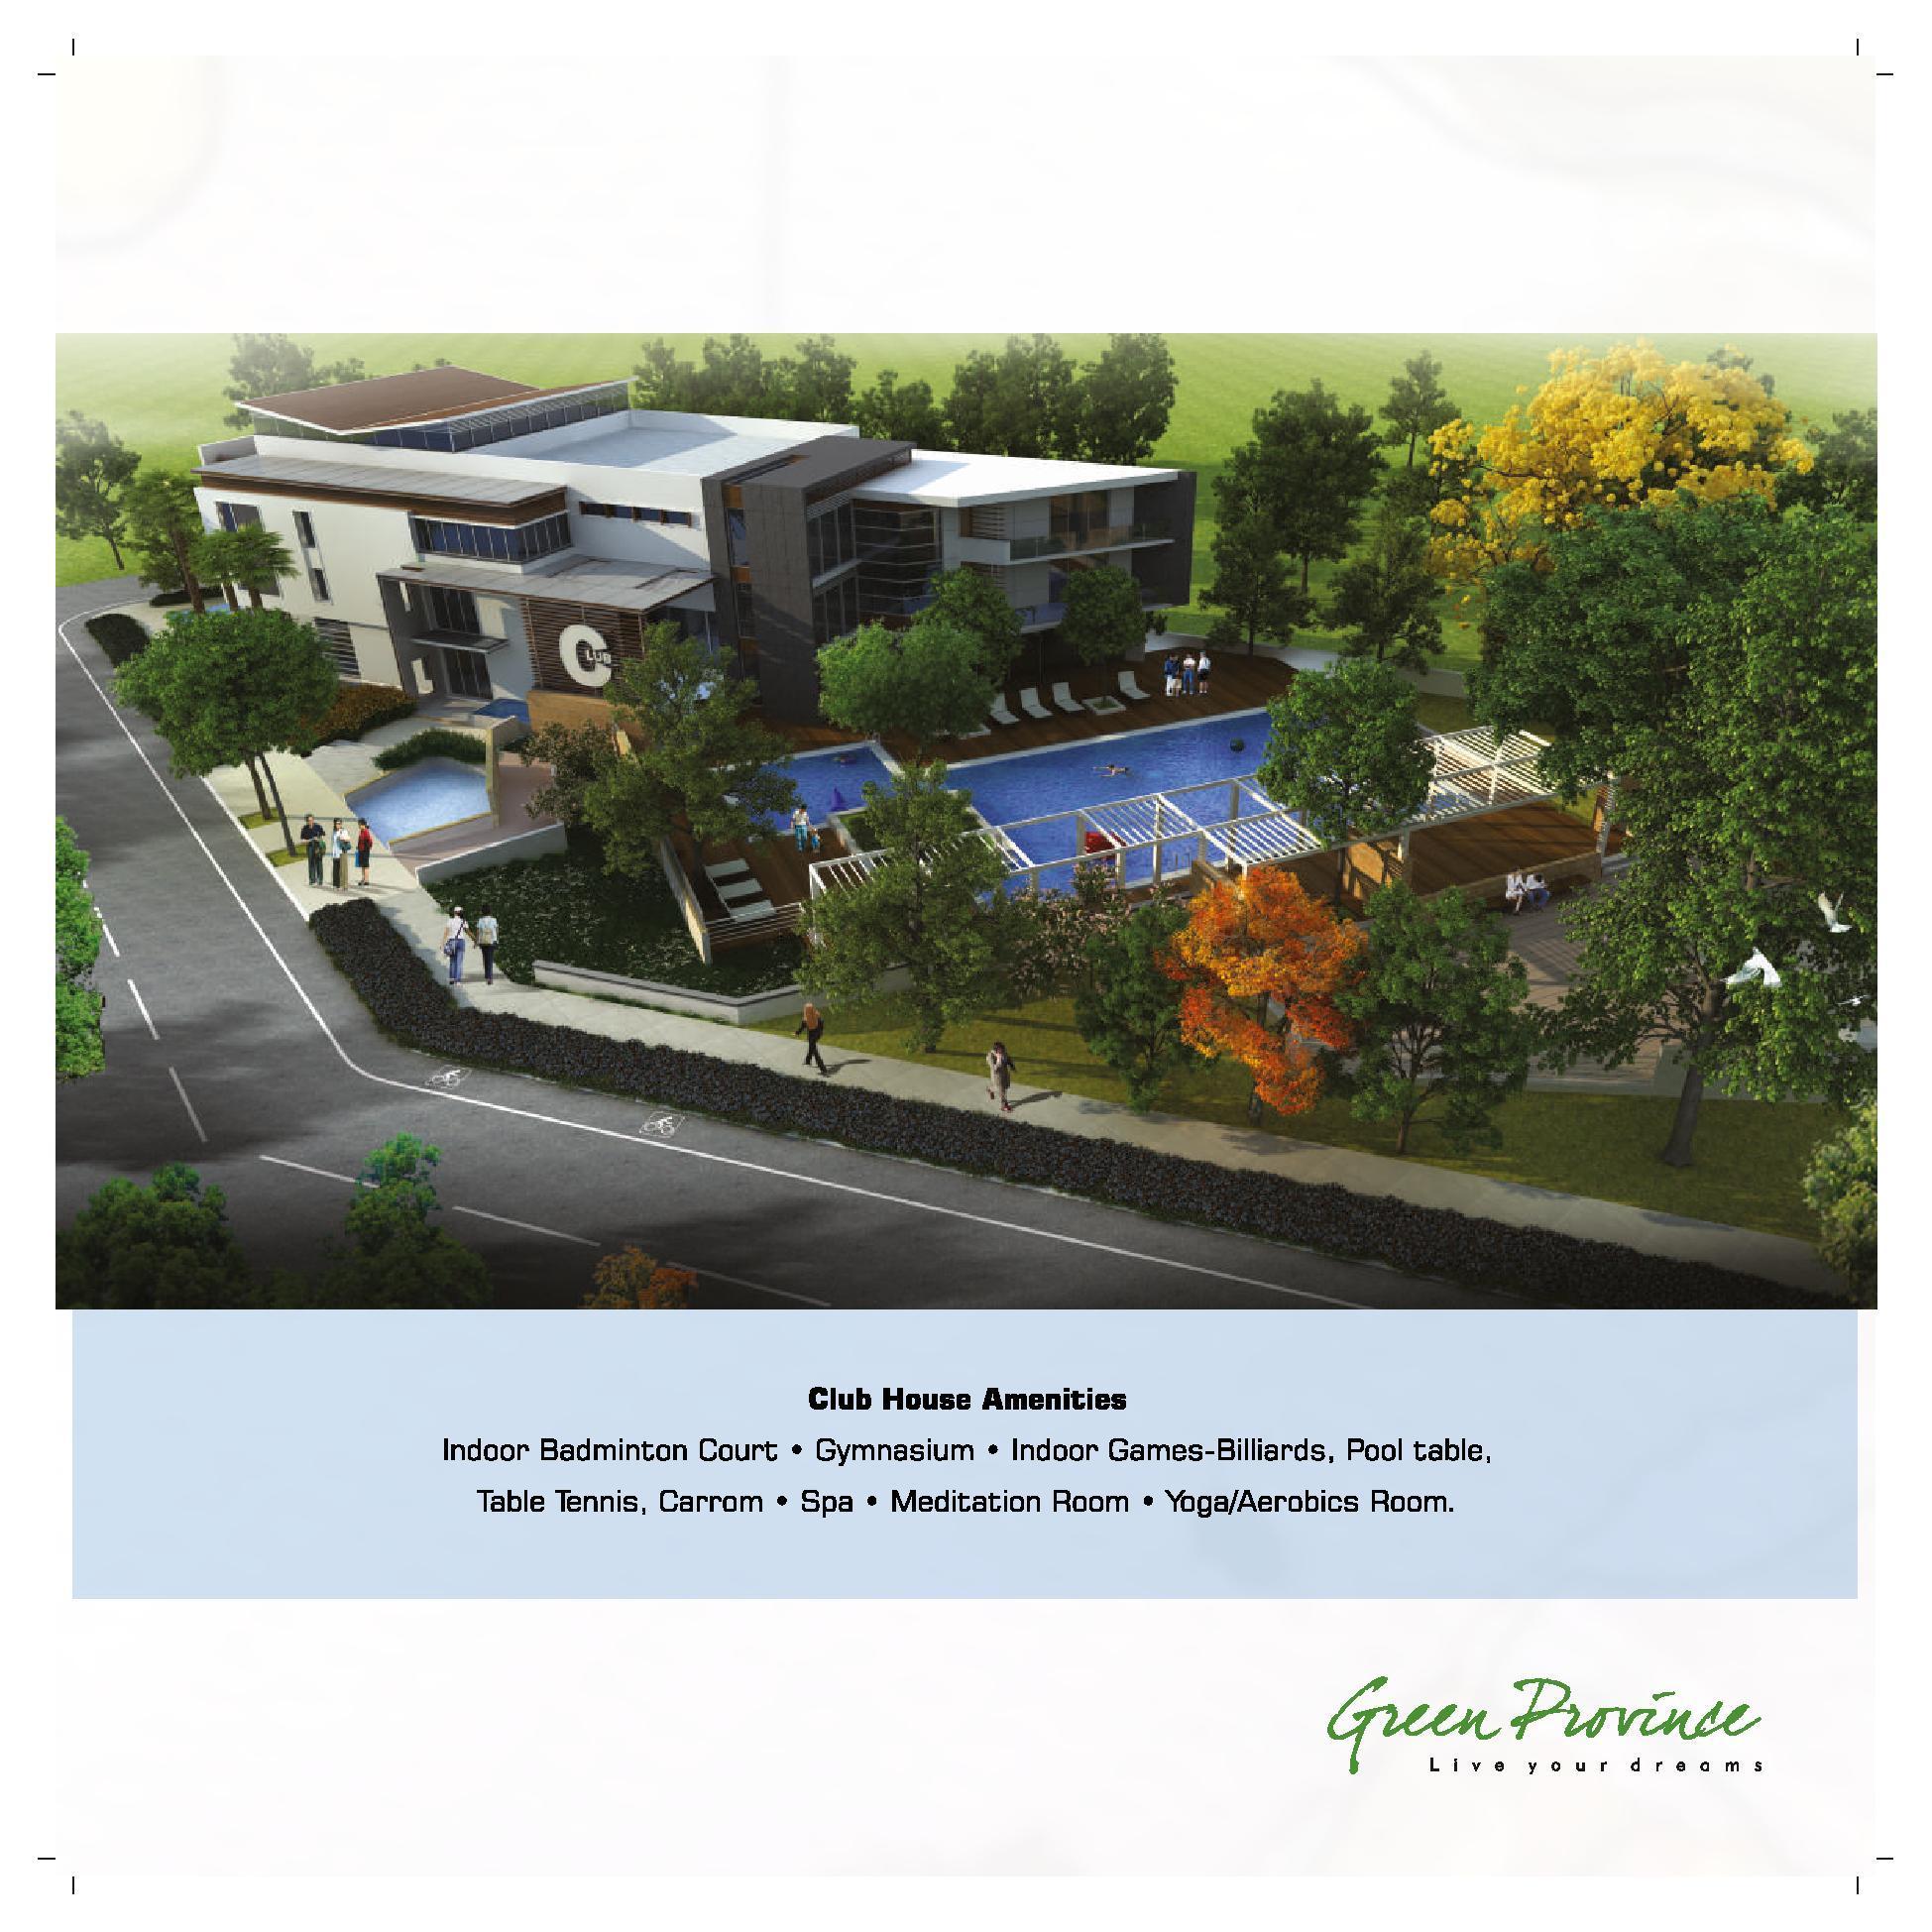 Ncc-Urban-Greens-Province-Gallery (1)